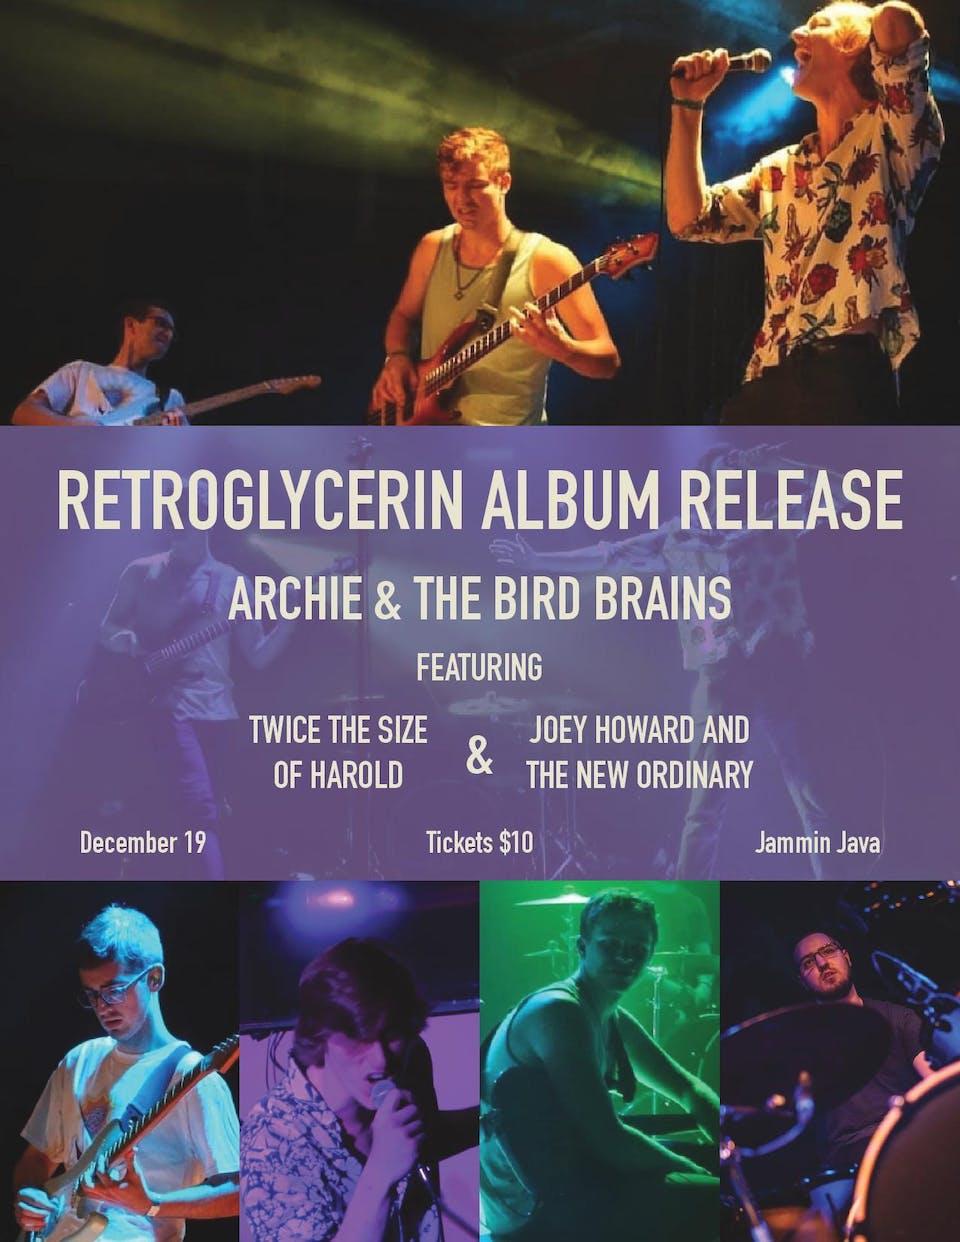 Retroglycerin Album Release feat. Archie & The Bird Brains